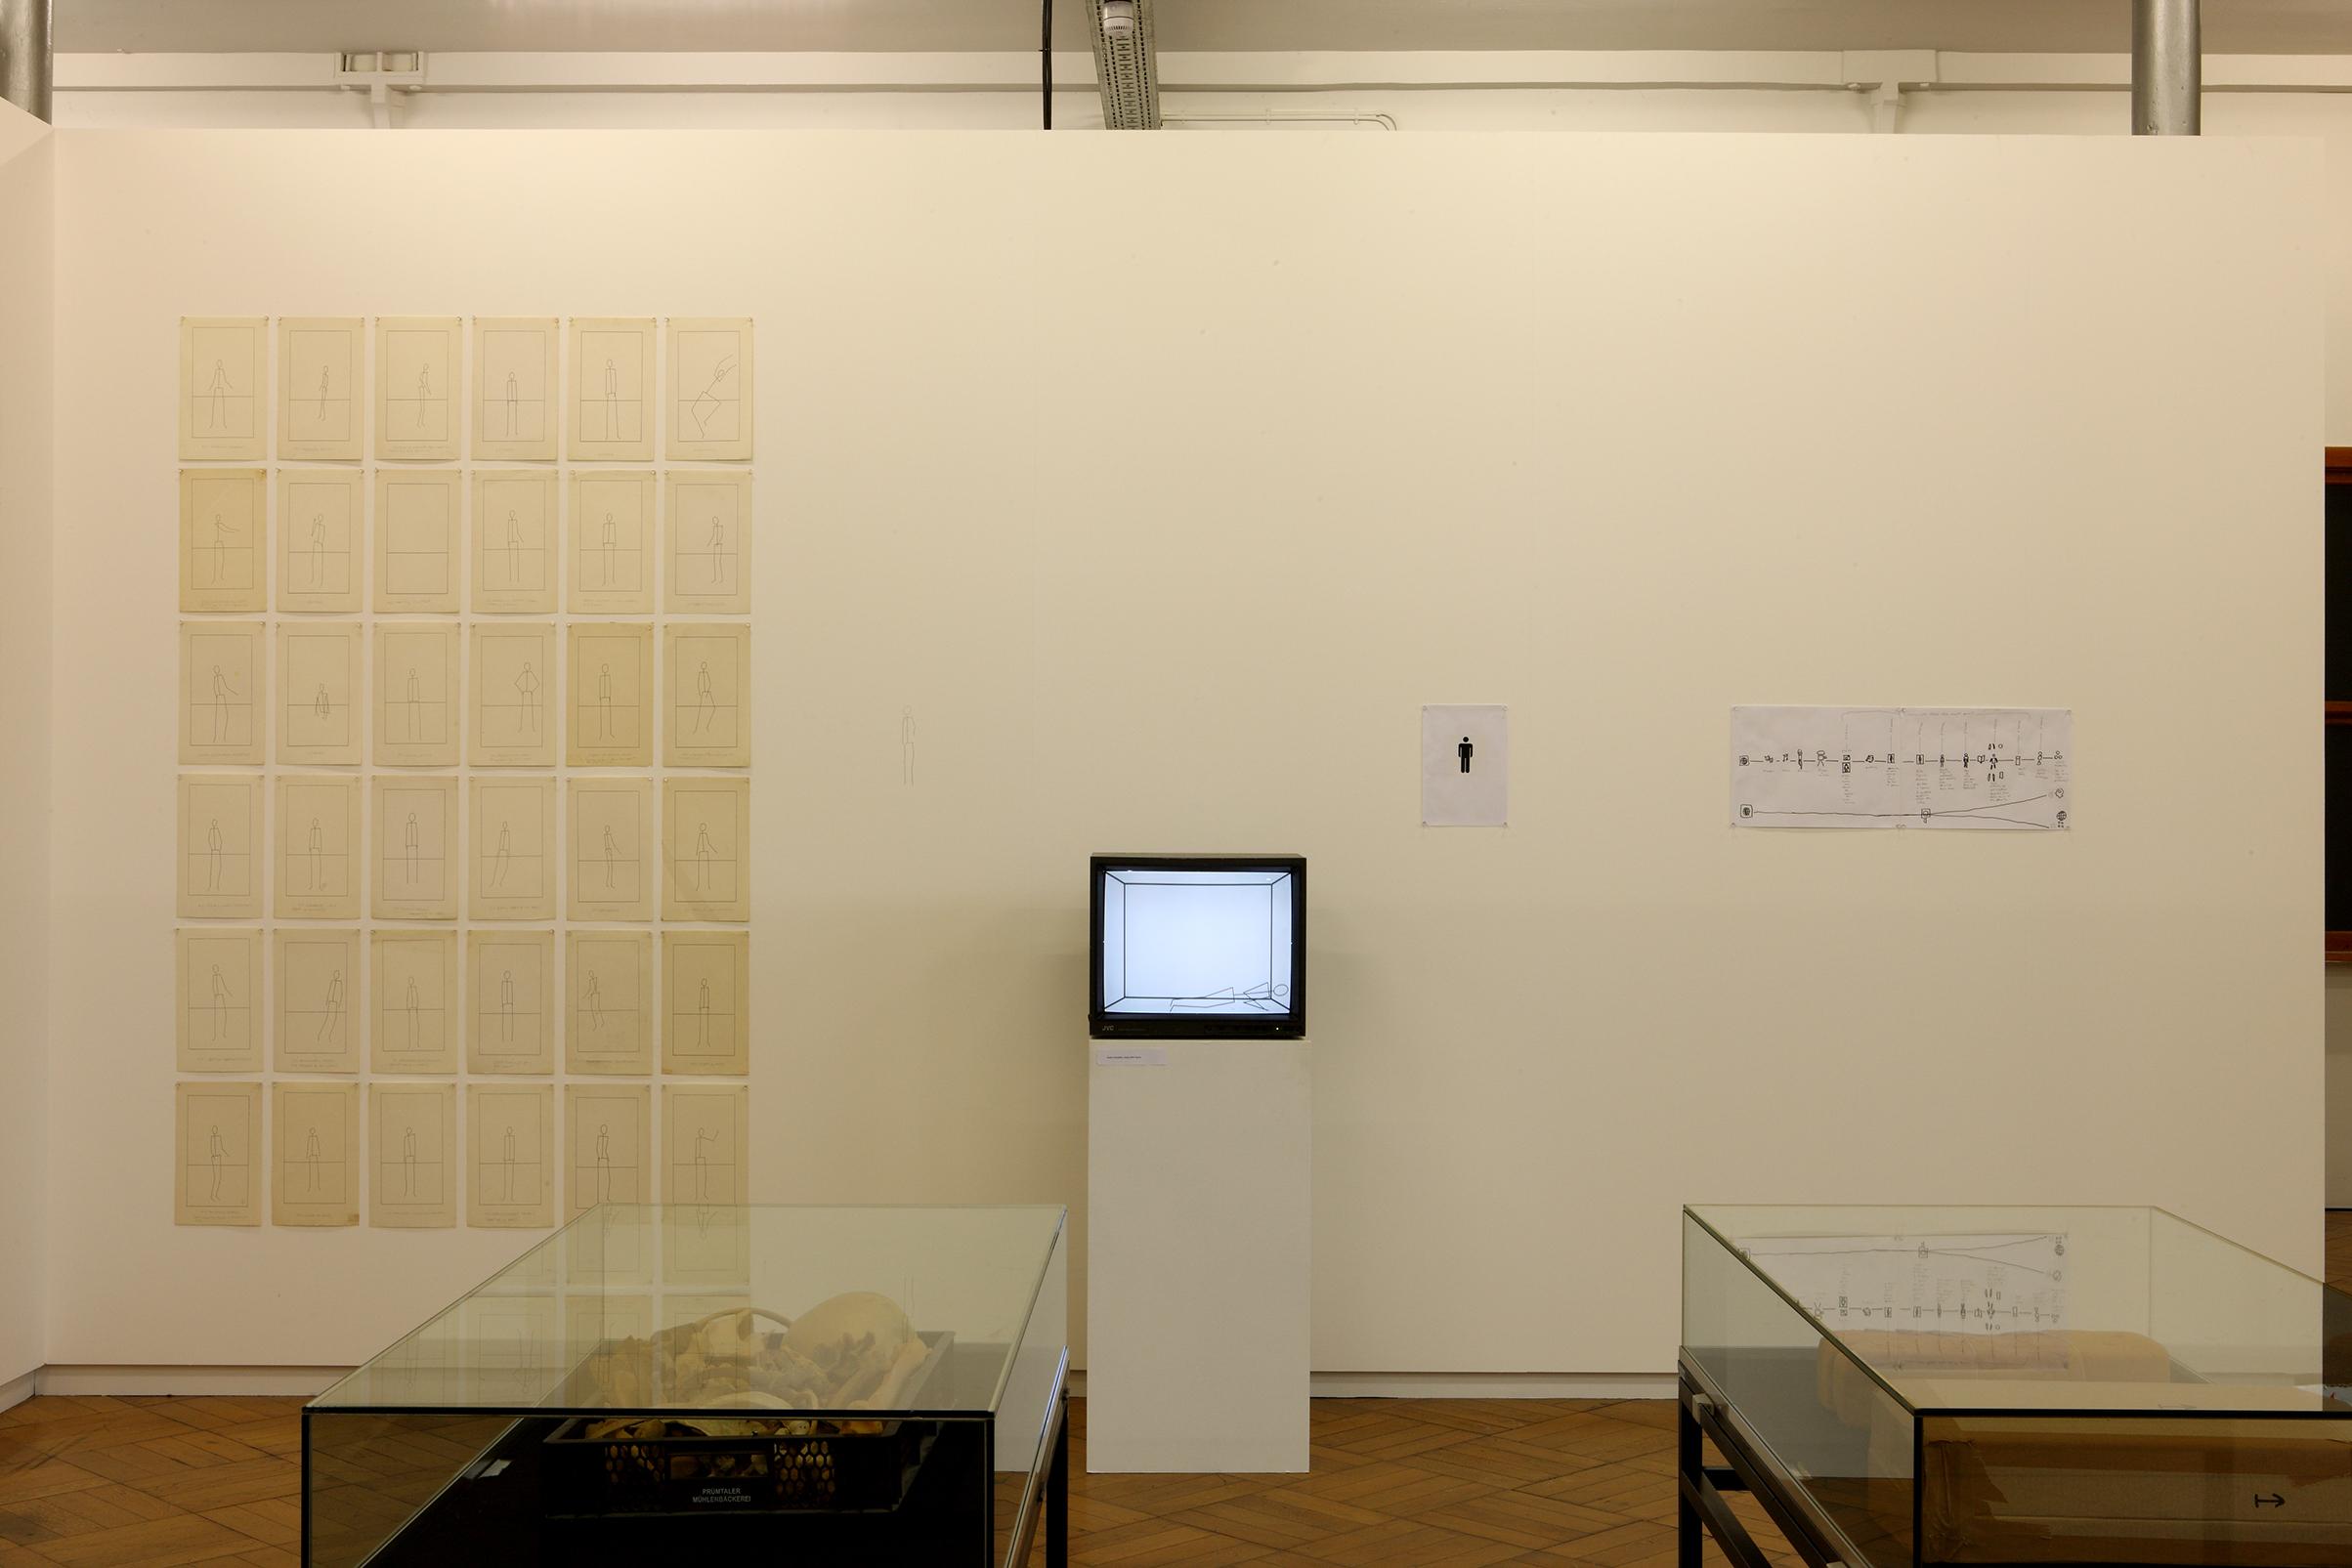 Intallation view: Matt Mullican, STUK Artcenter Leuven, 2009 |  | ProjecteSD